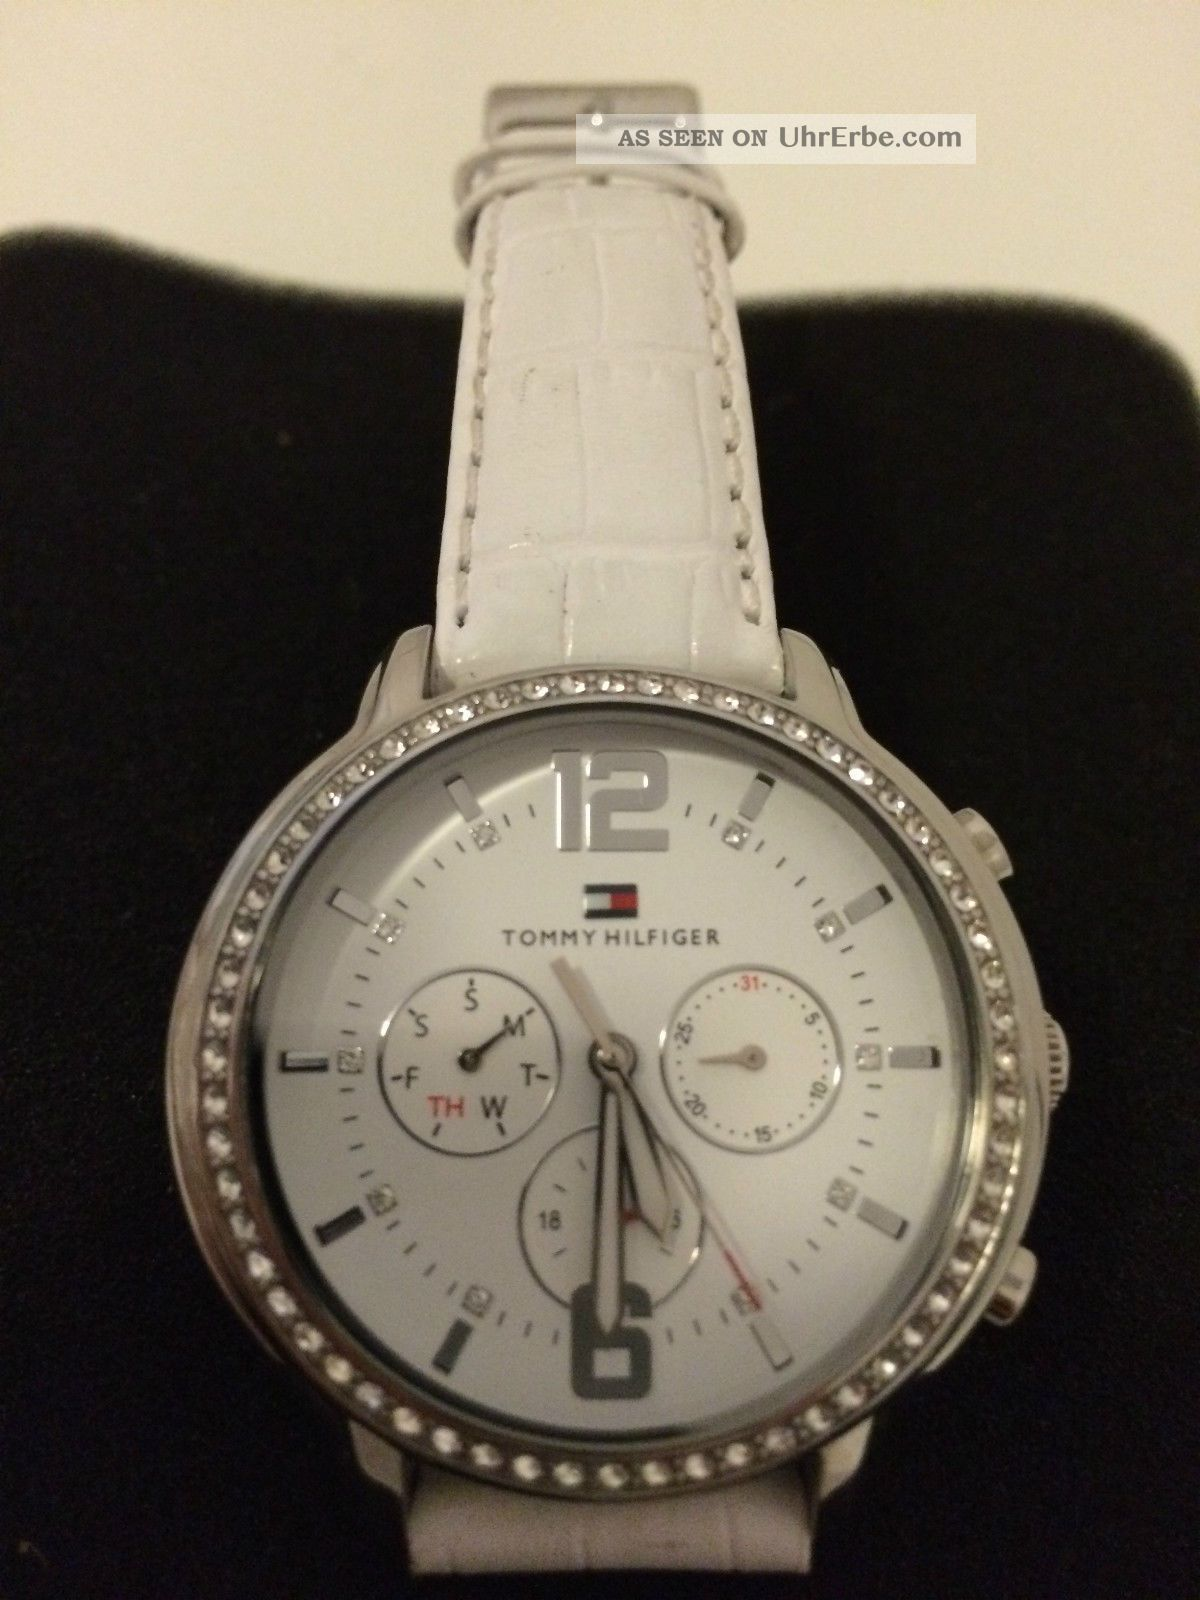 Tommy Hilfiger Casual Sport Reily Armbanduhr Für Damen Armbanduhren Bild